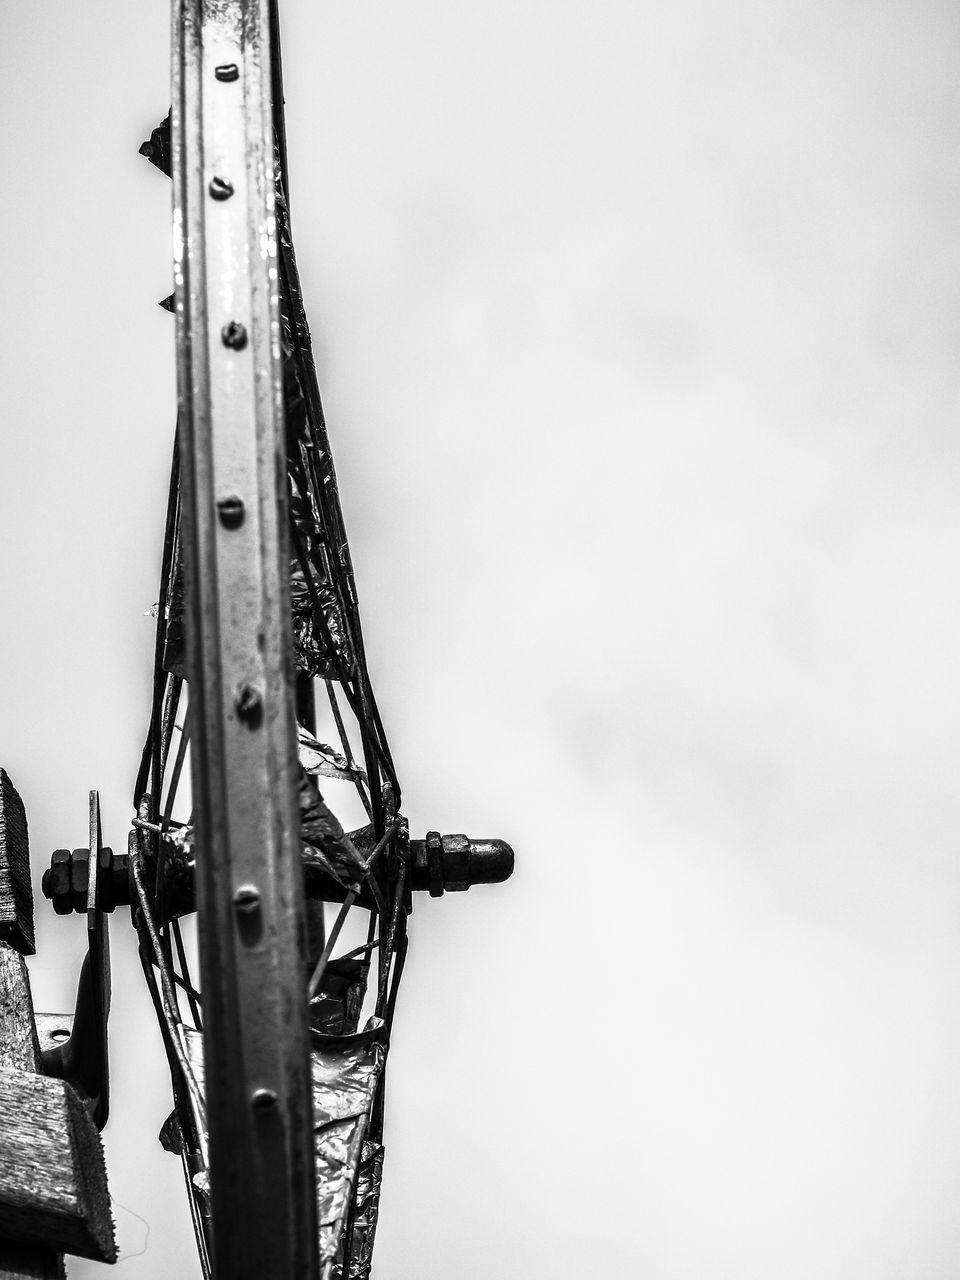 Close-Up Of Metal Wheel Against Sky